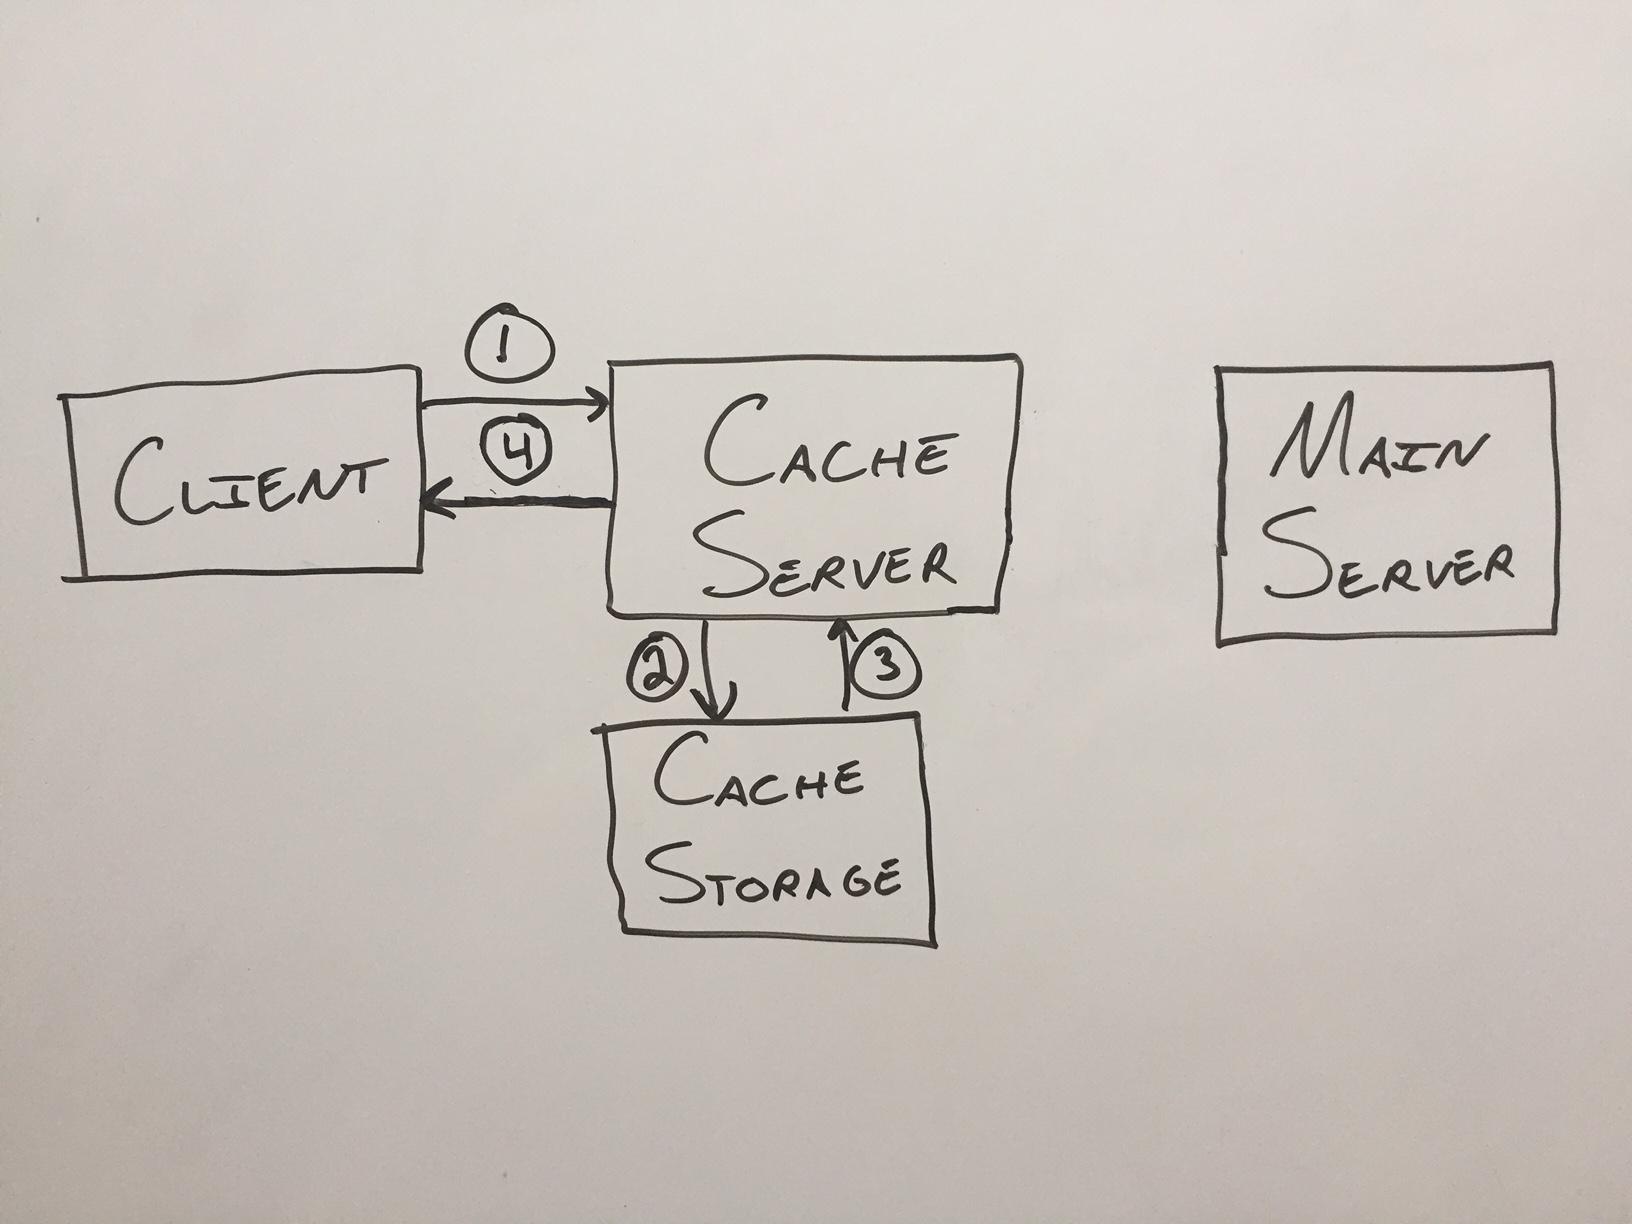 Building a Simple Cache Server in Python · Caffeinspiration